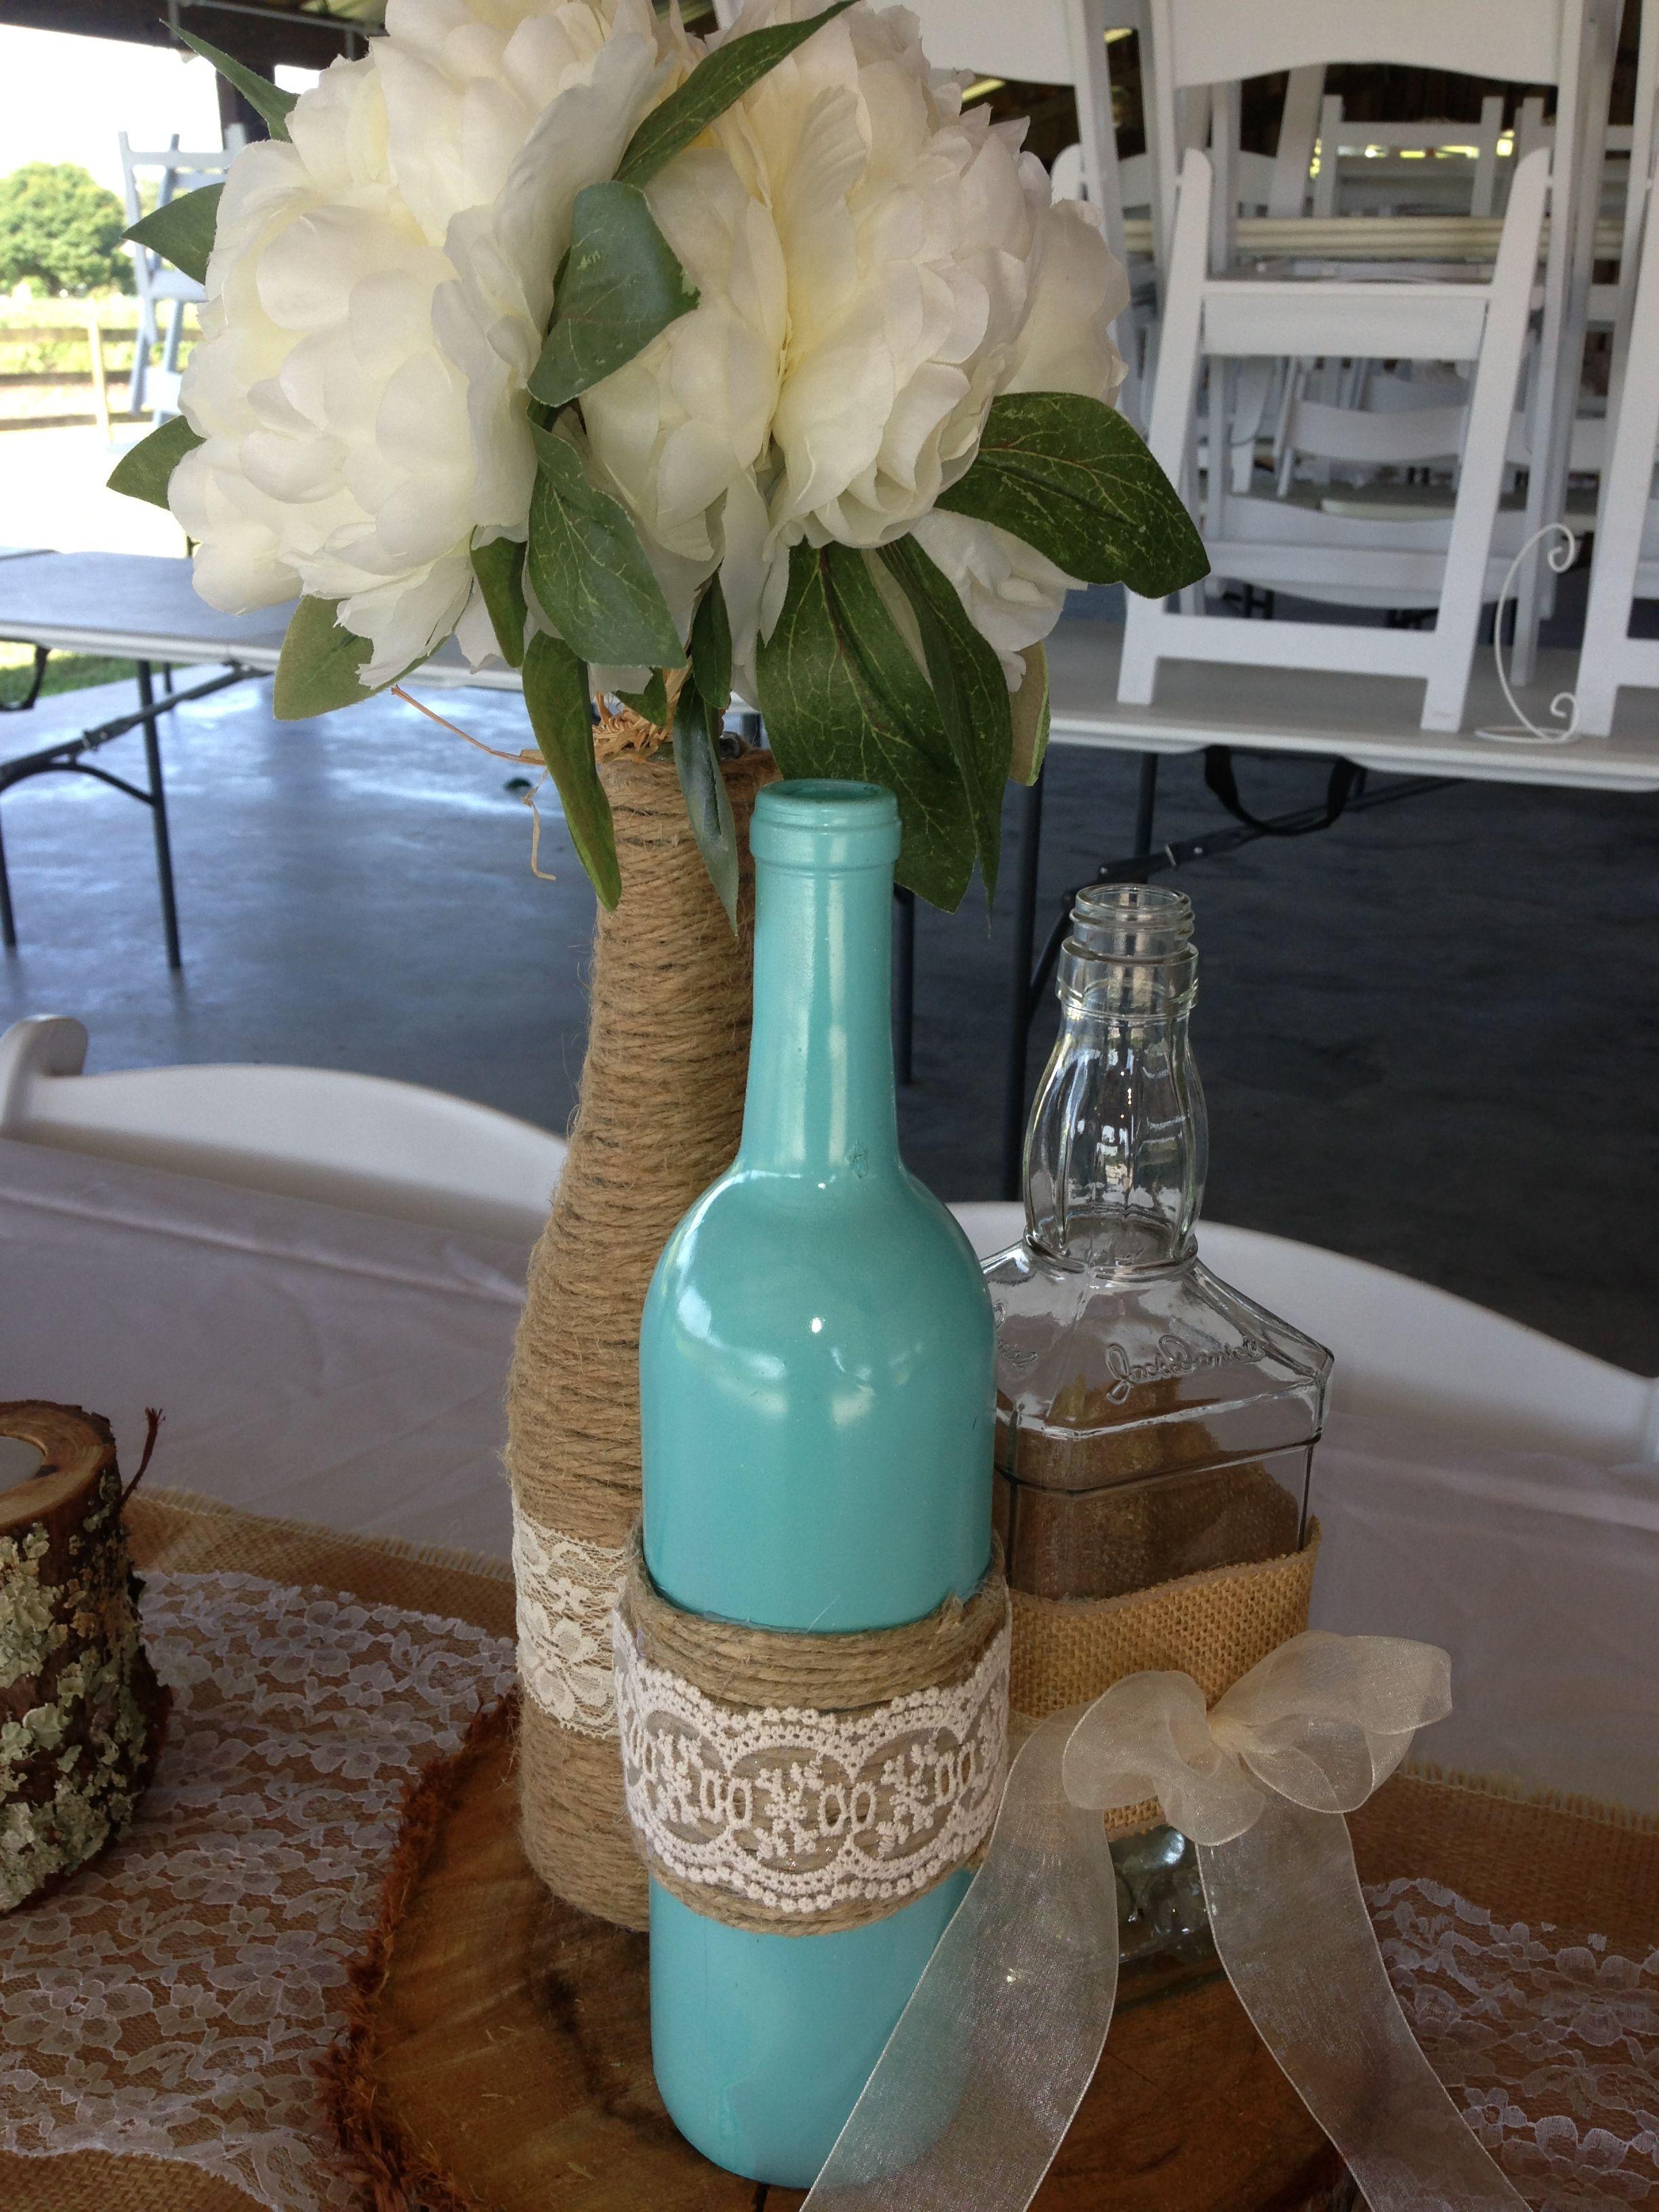 Wedding decorations with wine bottles  Tiffany Blue wine bottle decorations with twine and lace for a barn